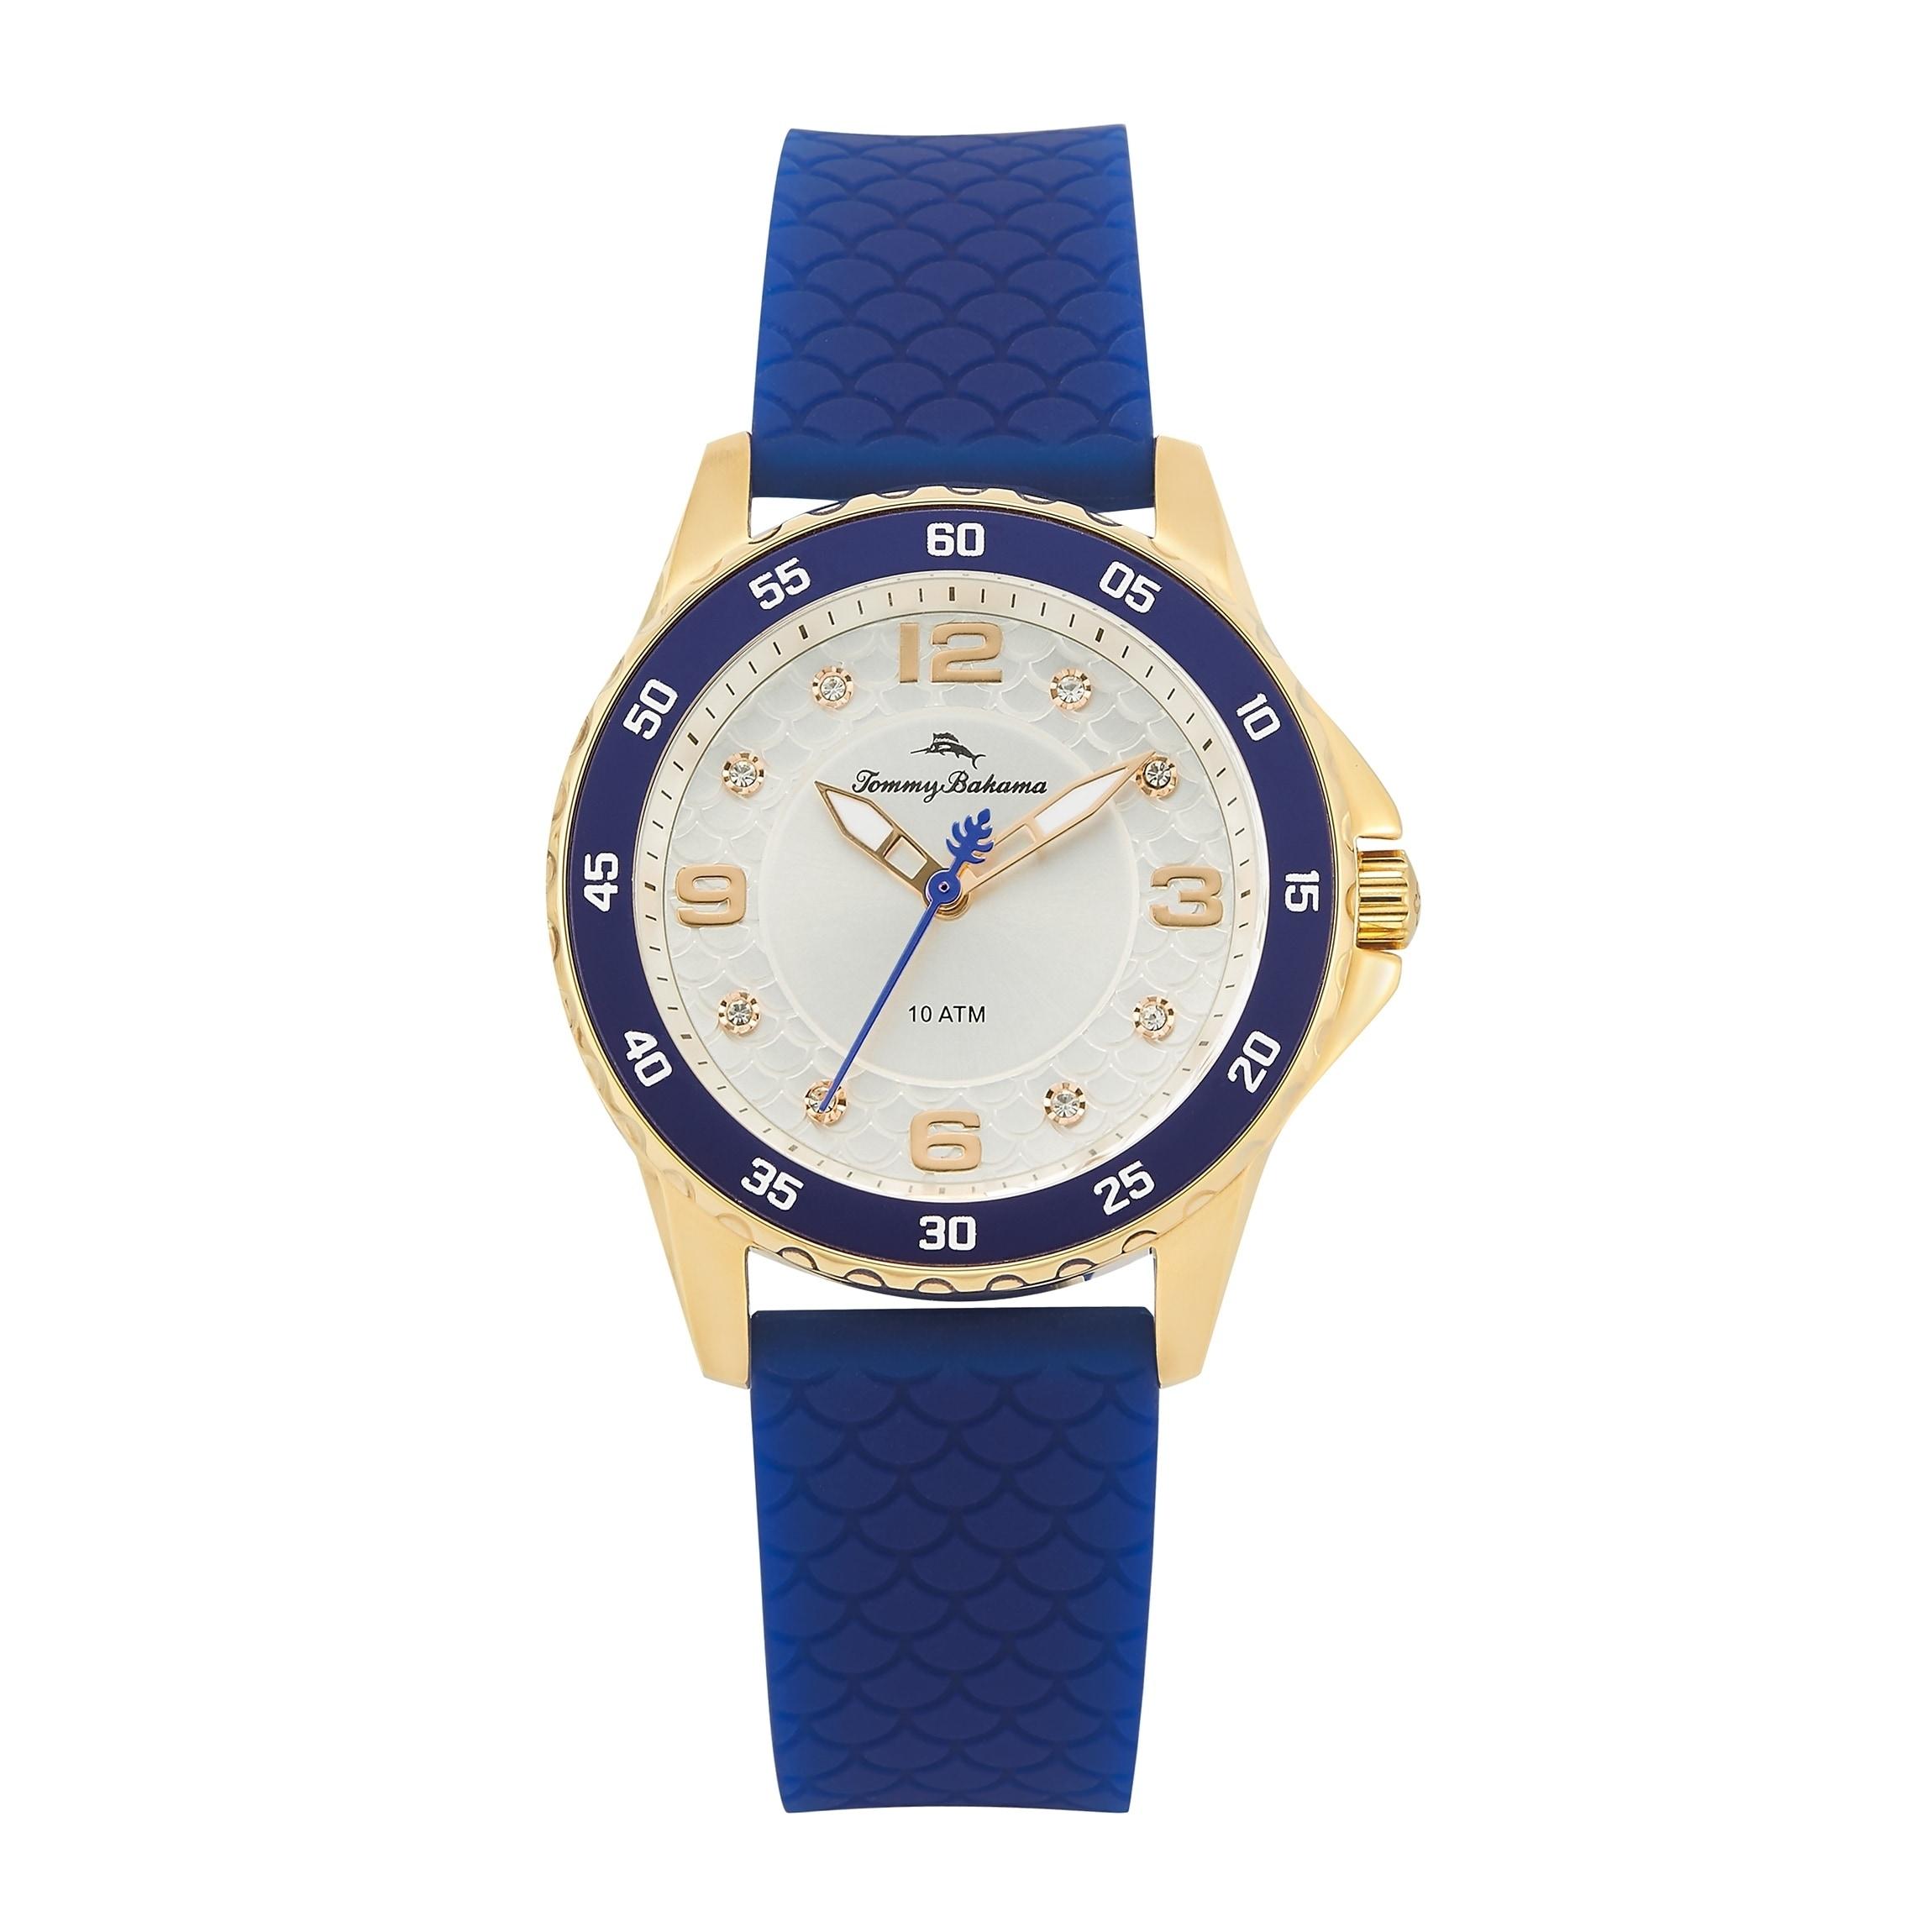 Tommy Bahama Surfside Sport Watch On Sale Overstock 29770613